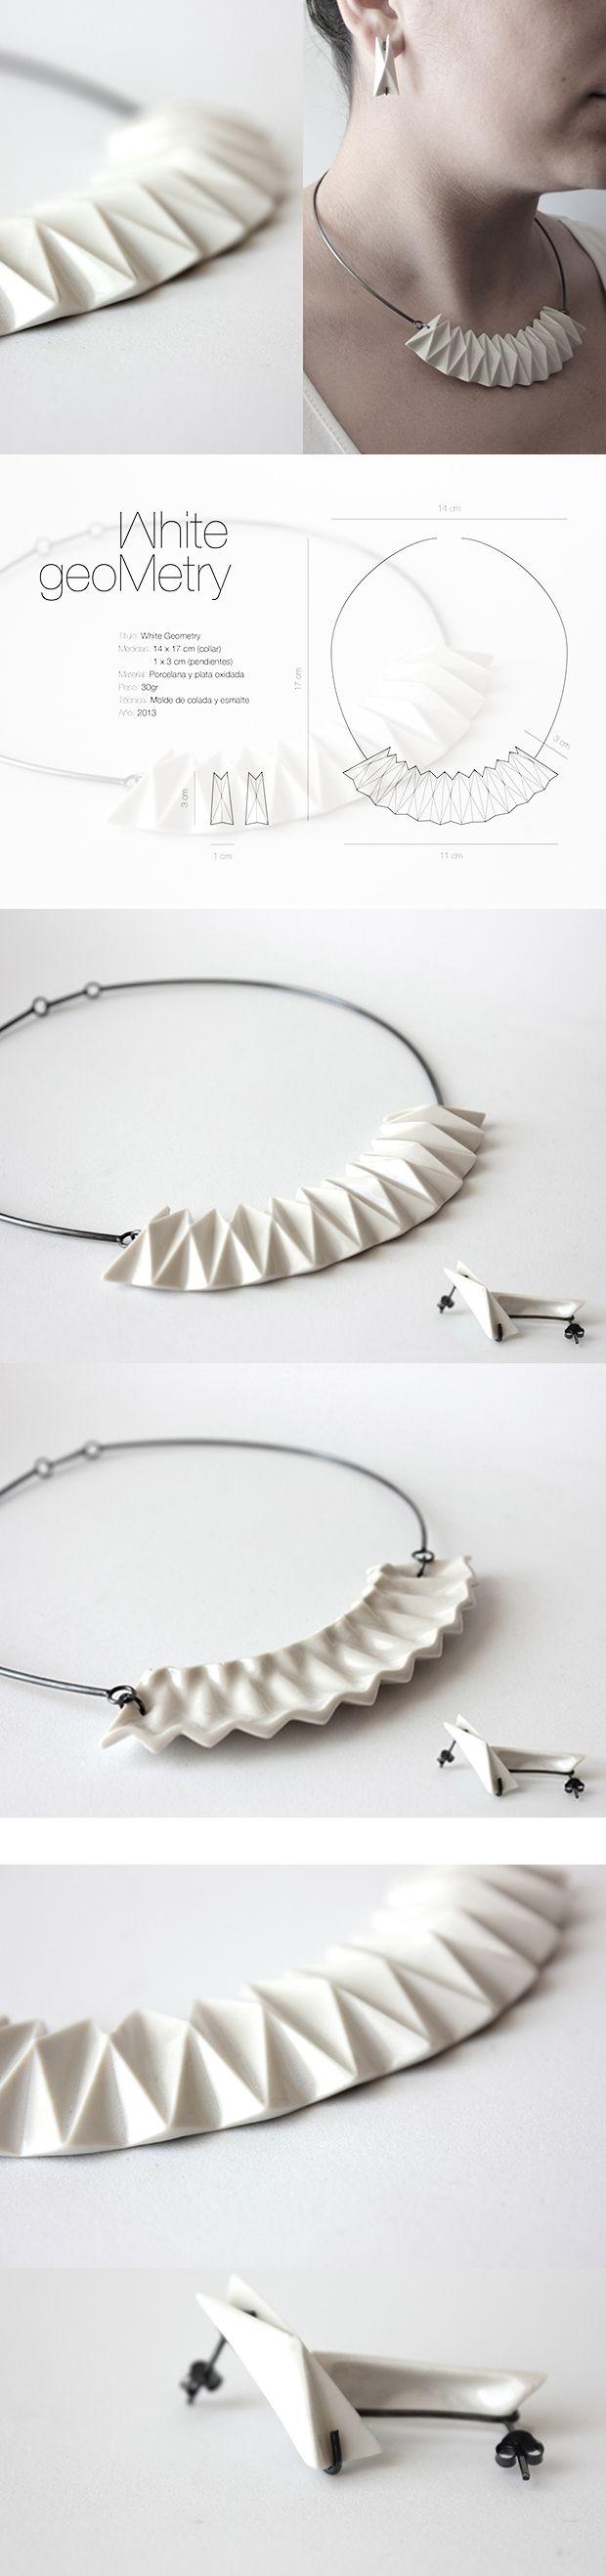 White Geometry By Minji Jung - MJ